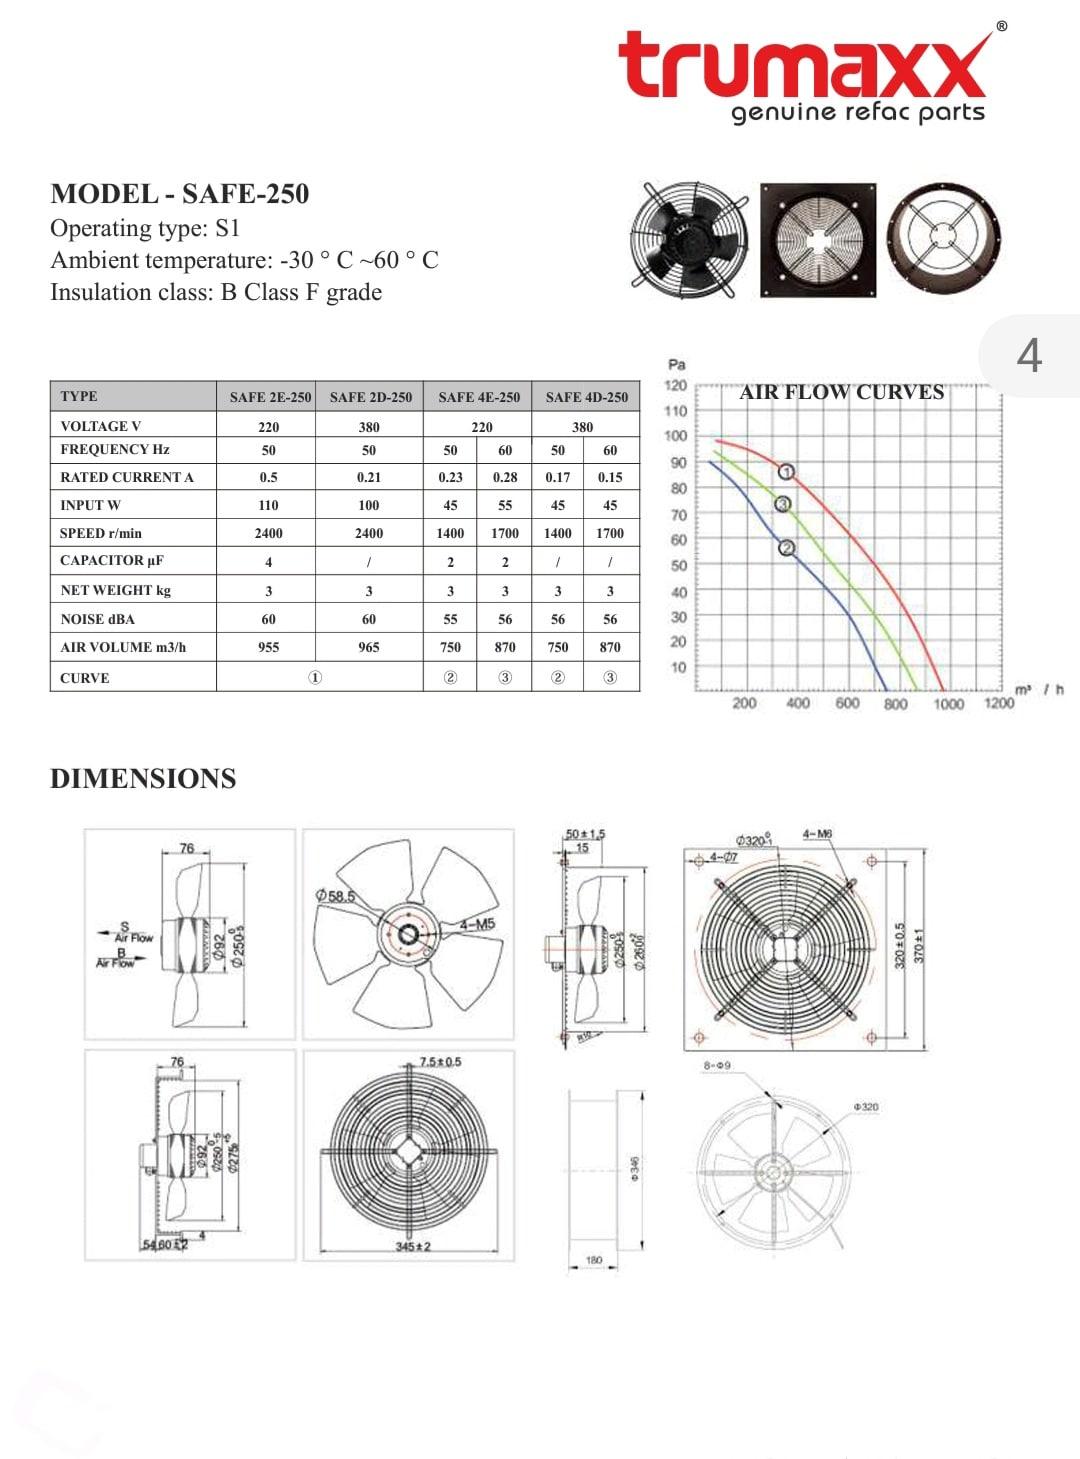 TRUMAXX AXIAL FAN (2E 250 S) (10')